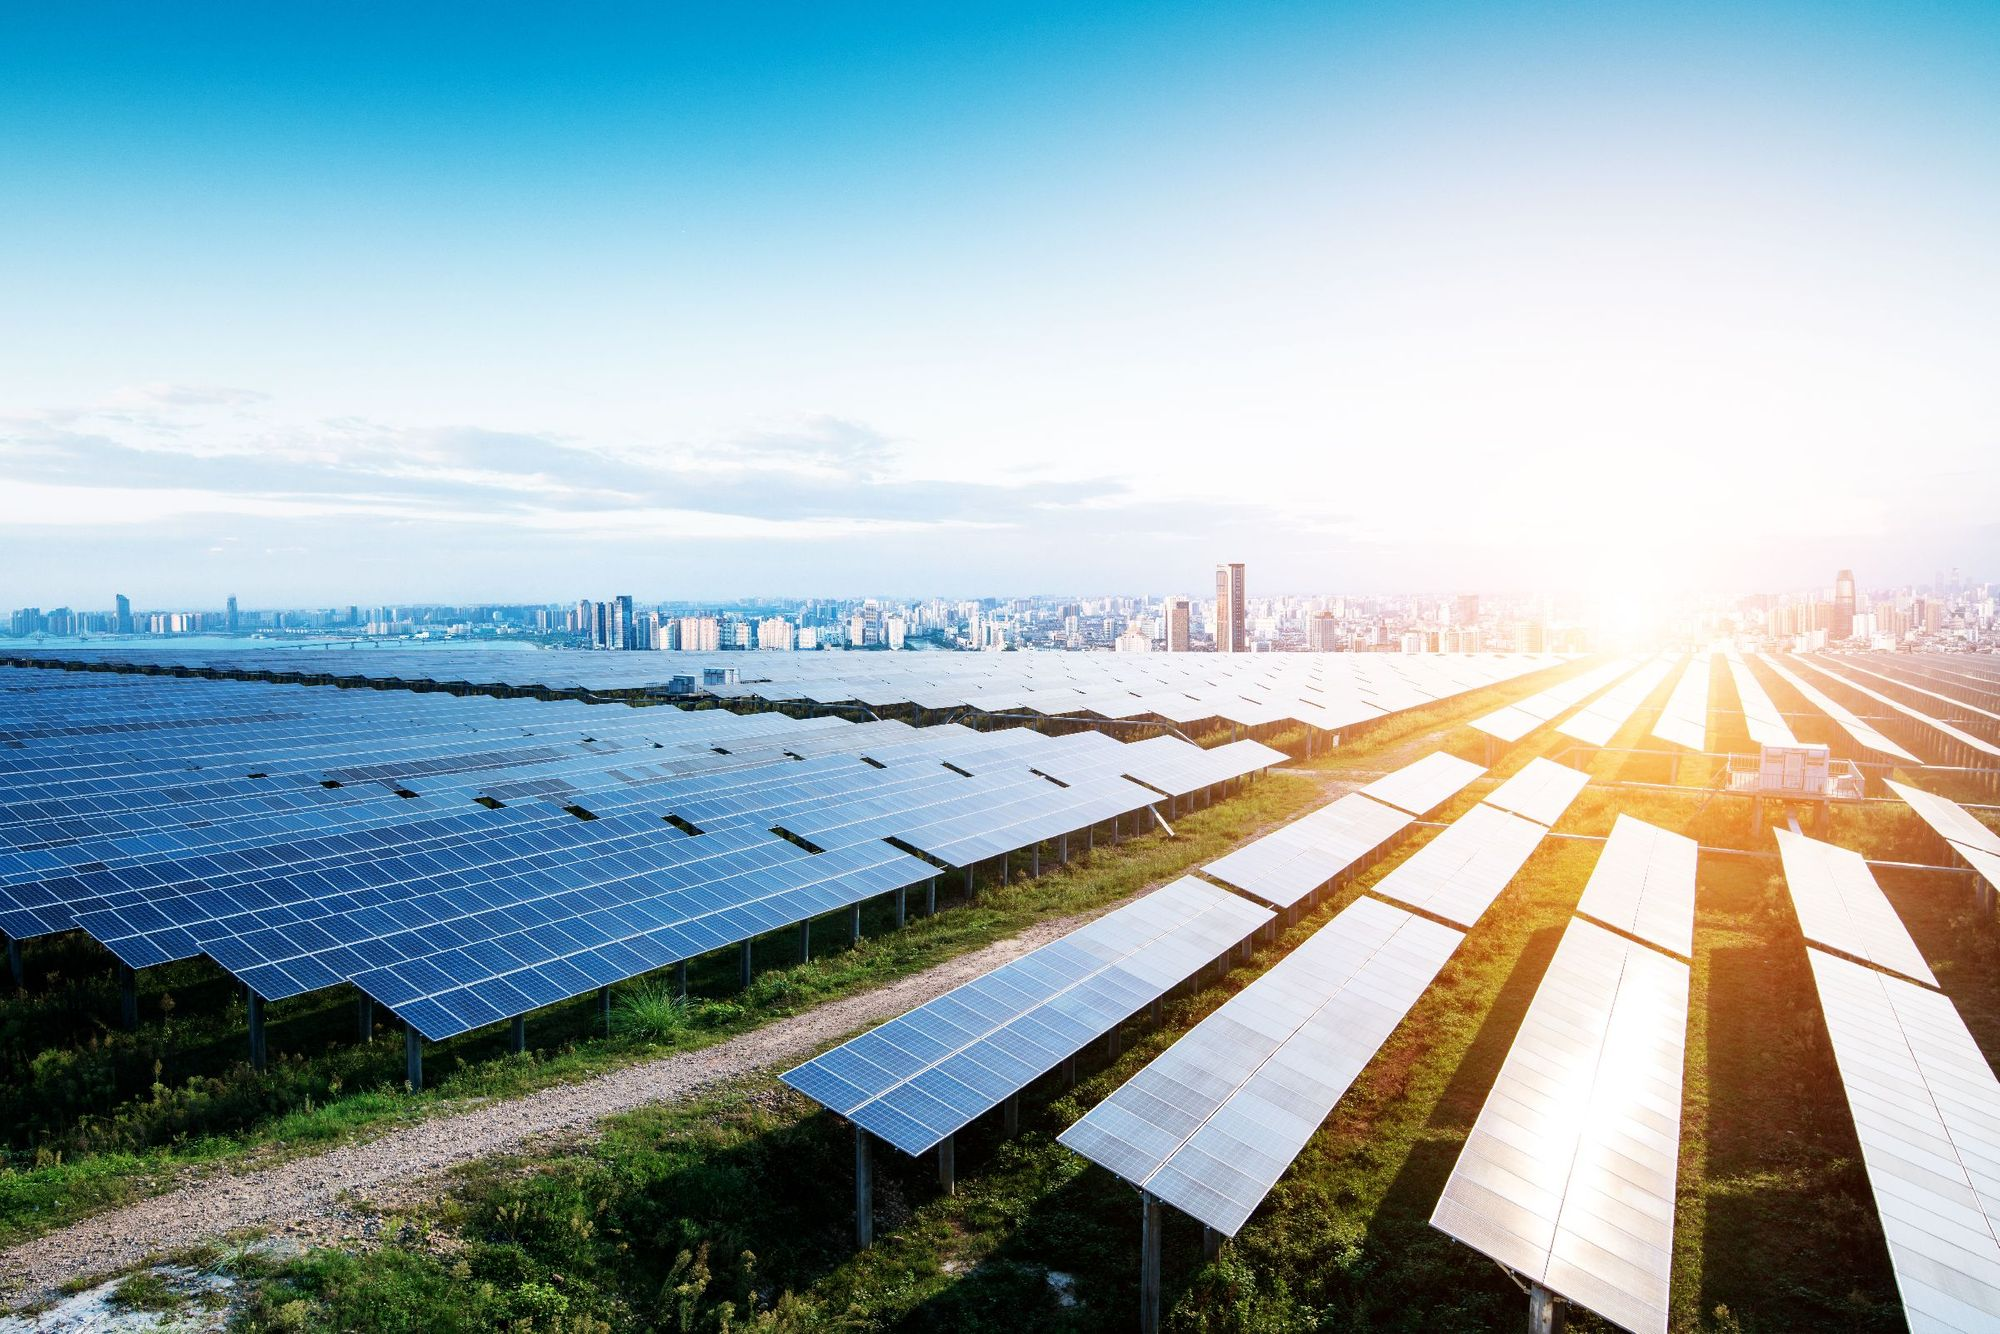 solar energy uses silver